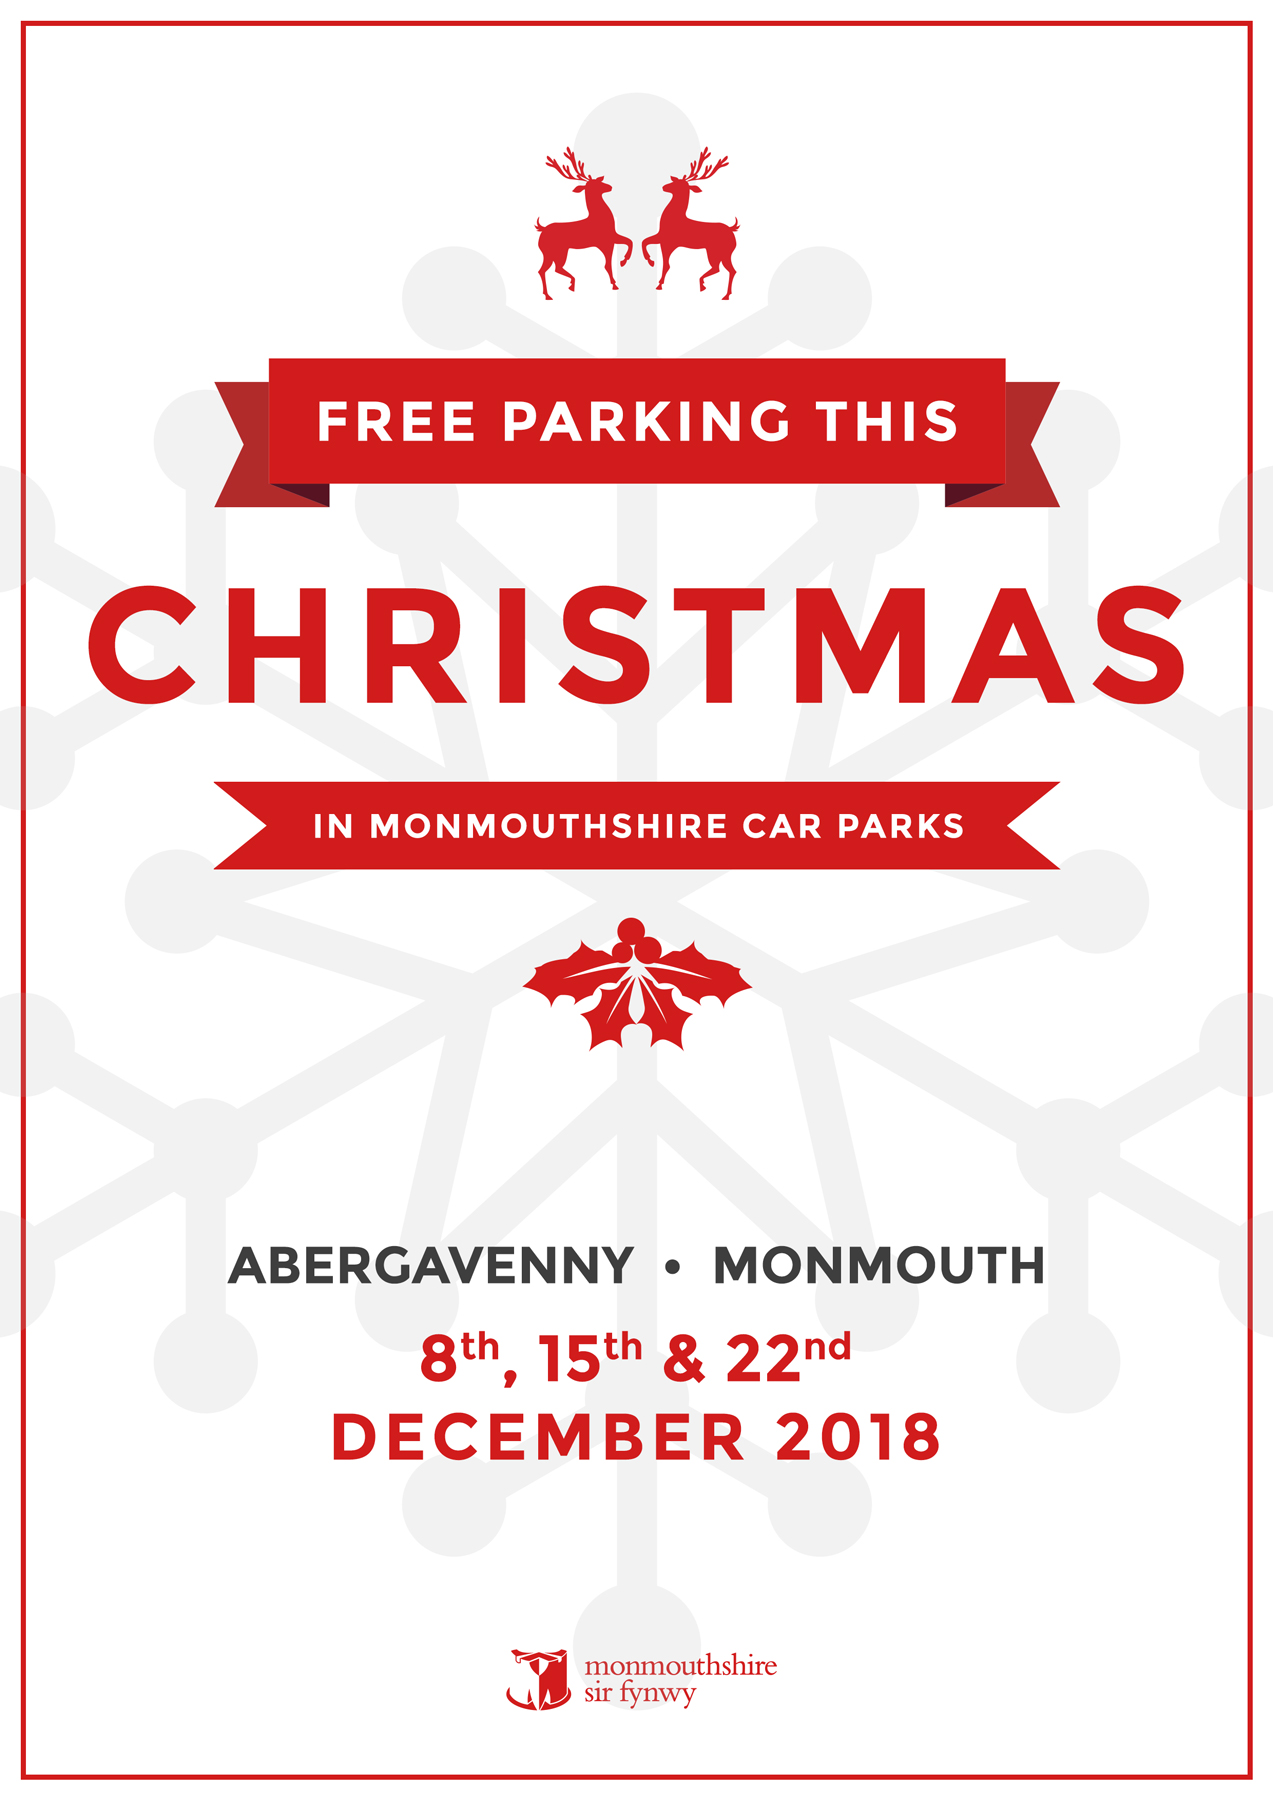 Christmas-Parking-Poster---AbMon-2018-ENG.jpg